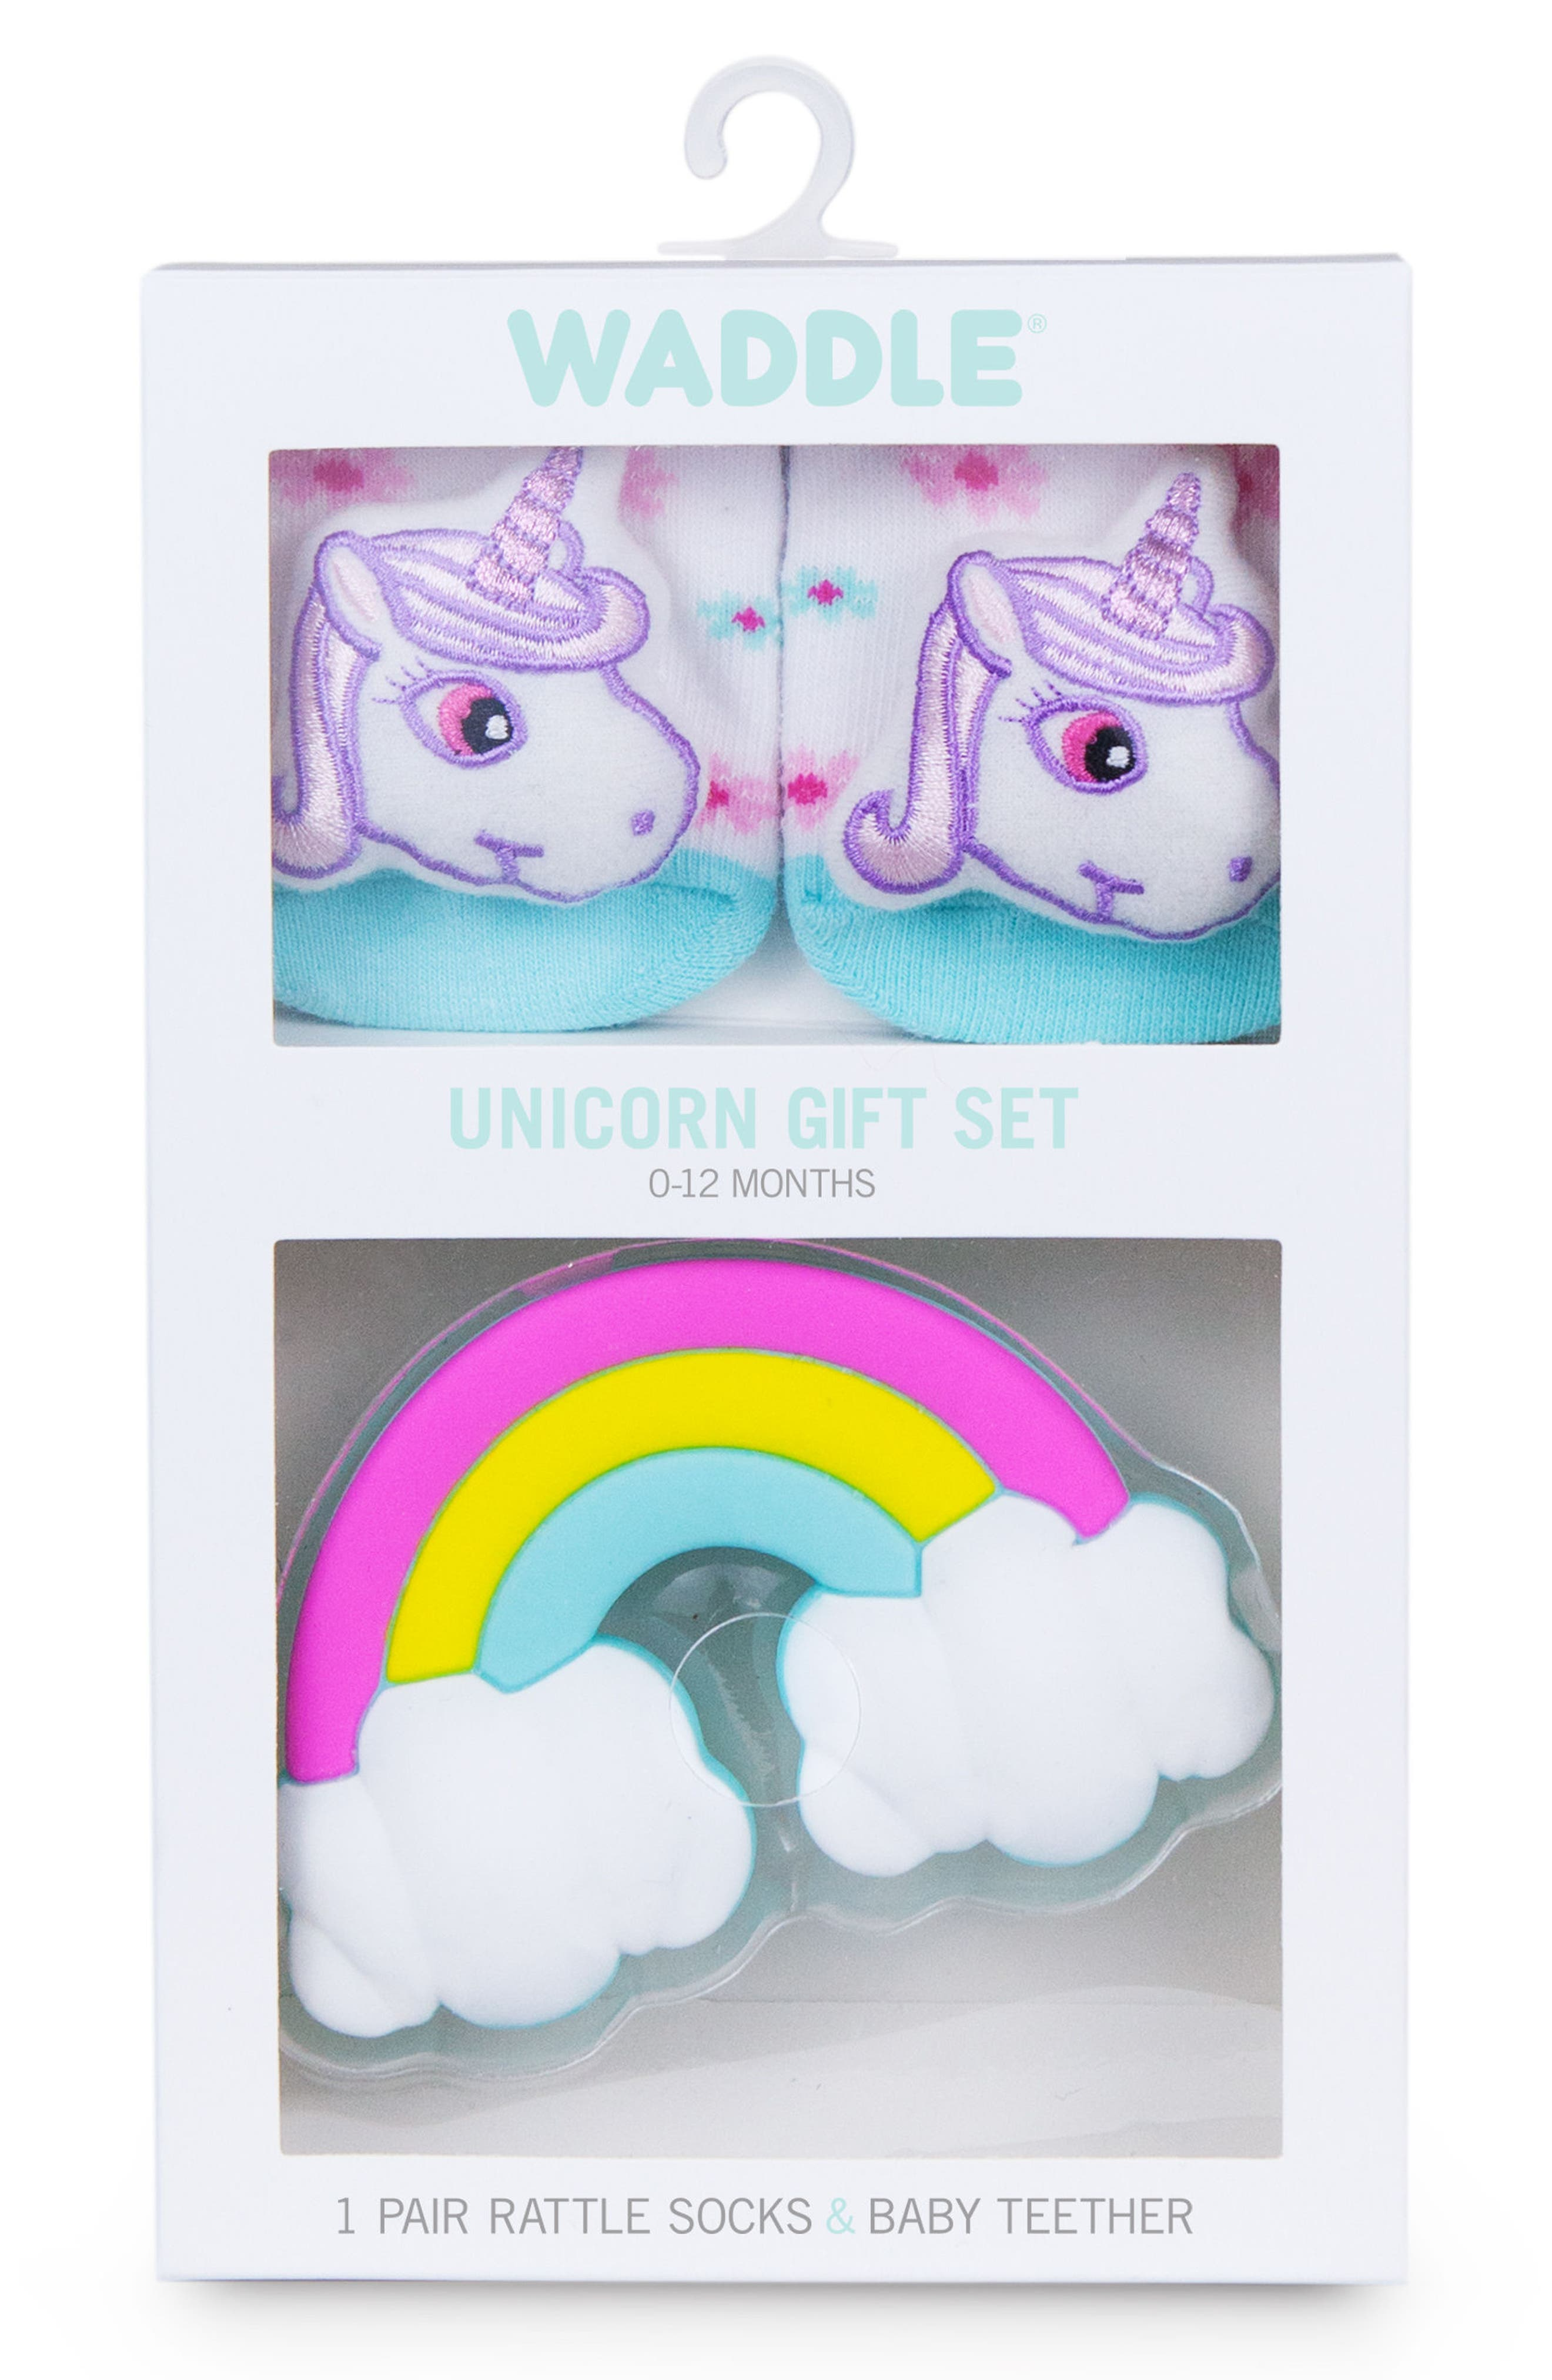 & Friends Unicorn Rattle Socks & Teether Gift Set,                             Alternate thumbnail 2, color,                             100